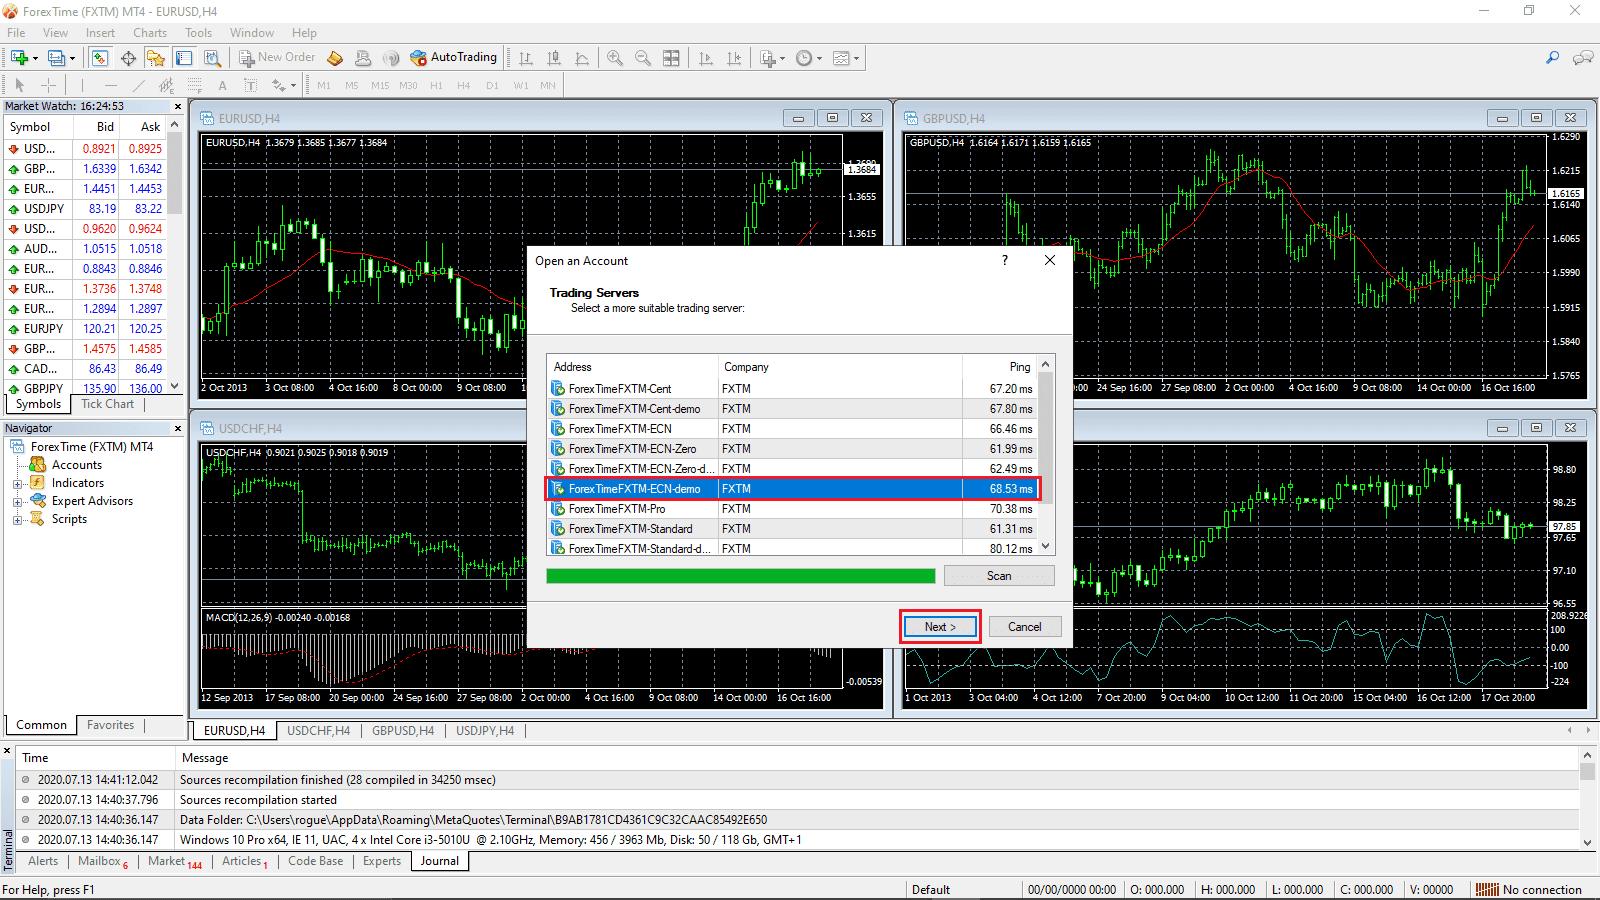 Ayrex Broker Deposits/Withdrawal